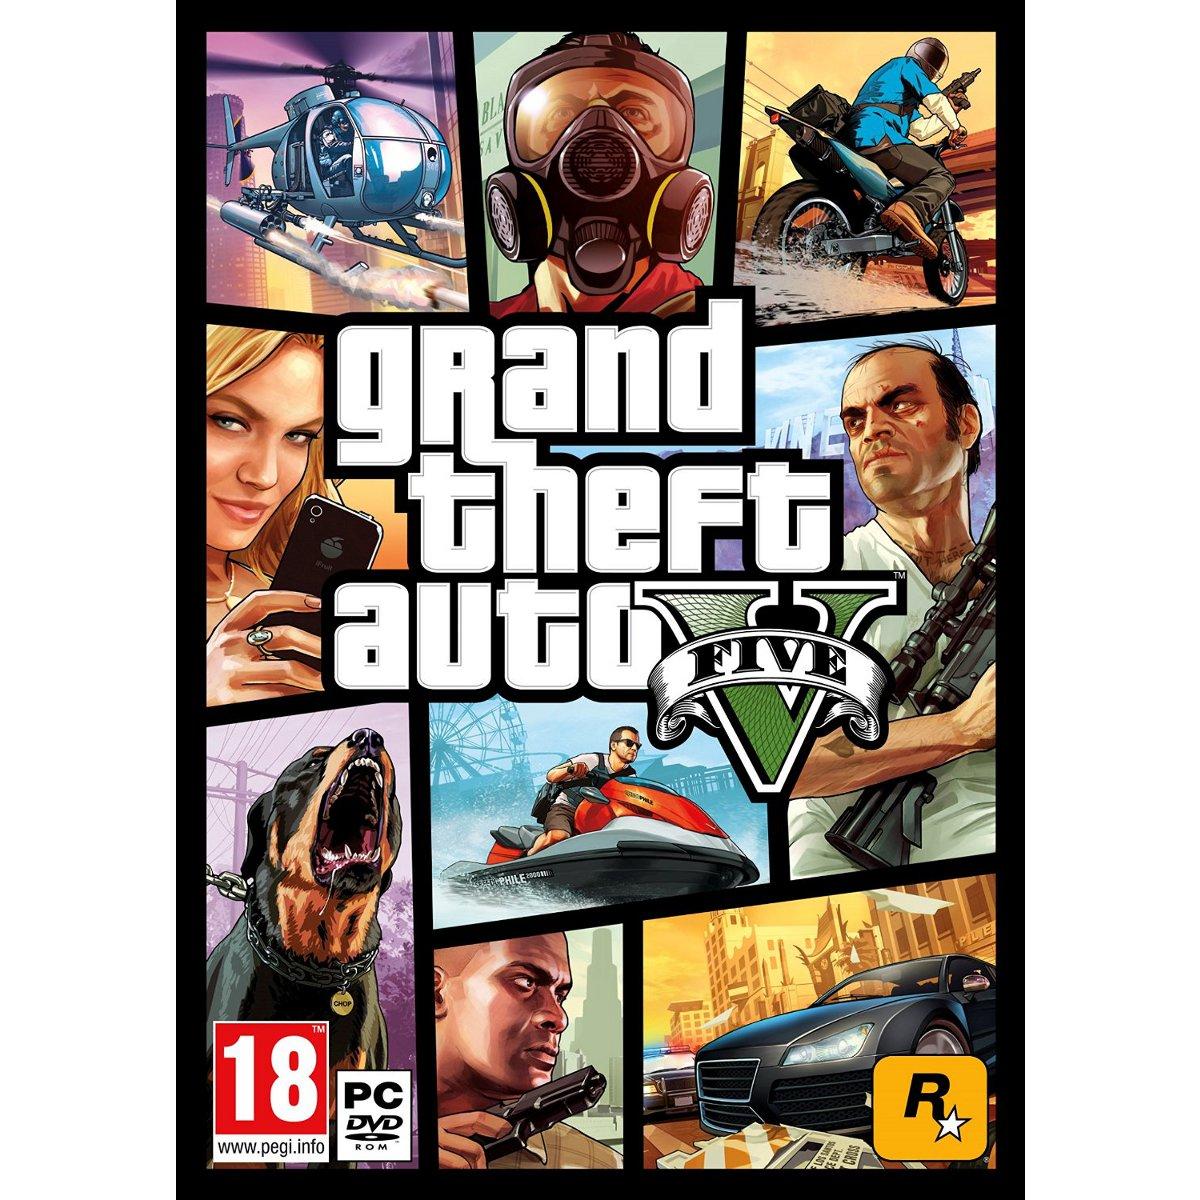 Jeux PC Grand Theft Auto V - GTA 5 (PC) Grand Theft Auto V - GTA 5 (PC)